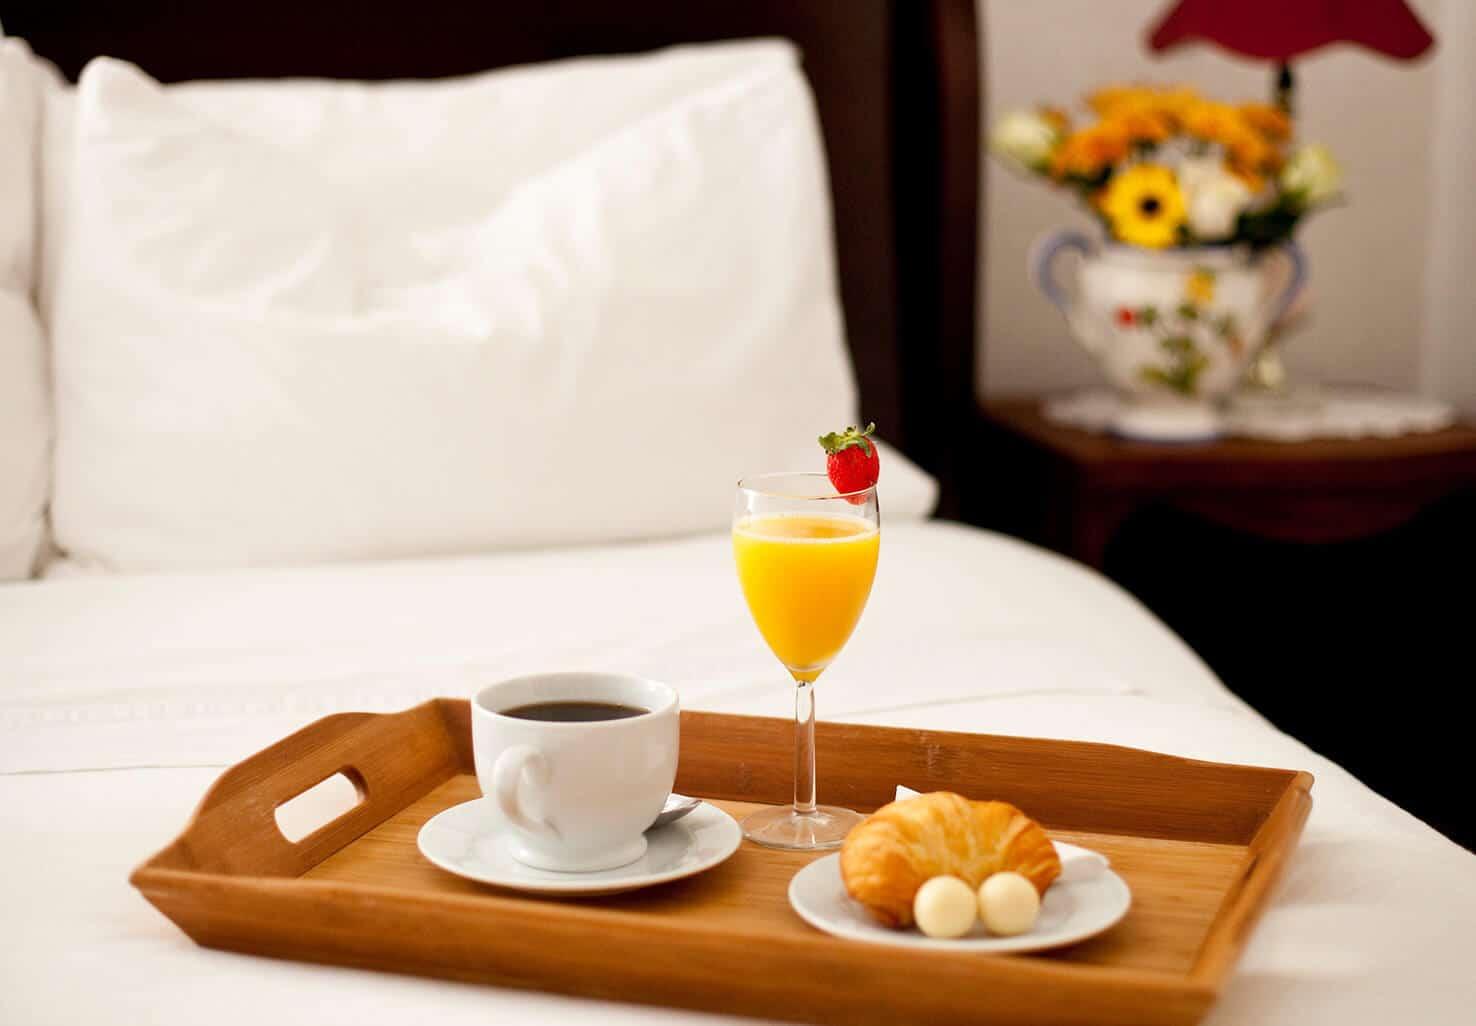 Breakfast in Bed at a Washington DC Inn